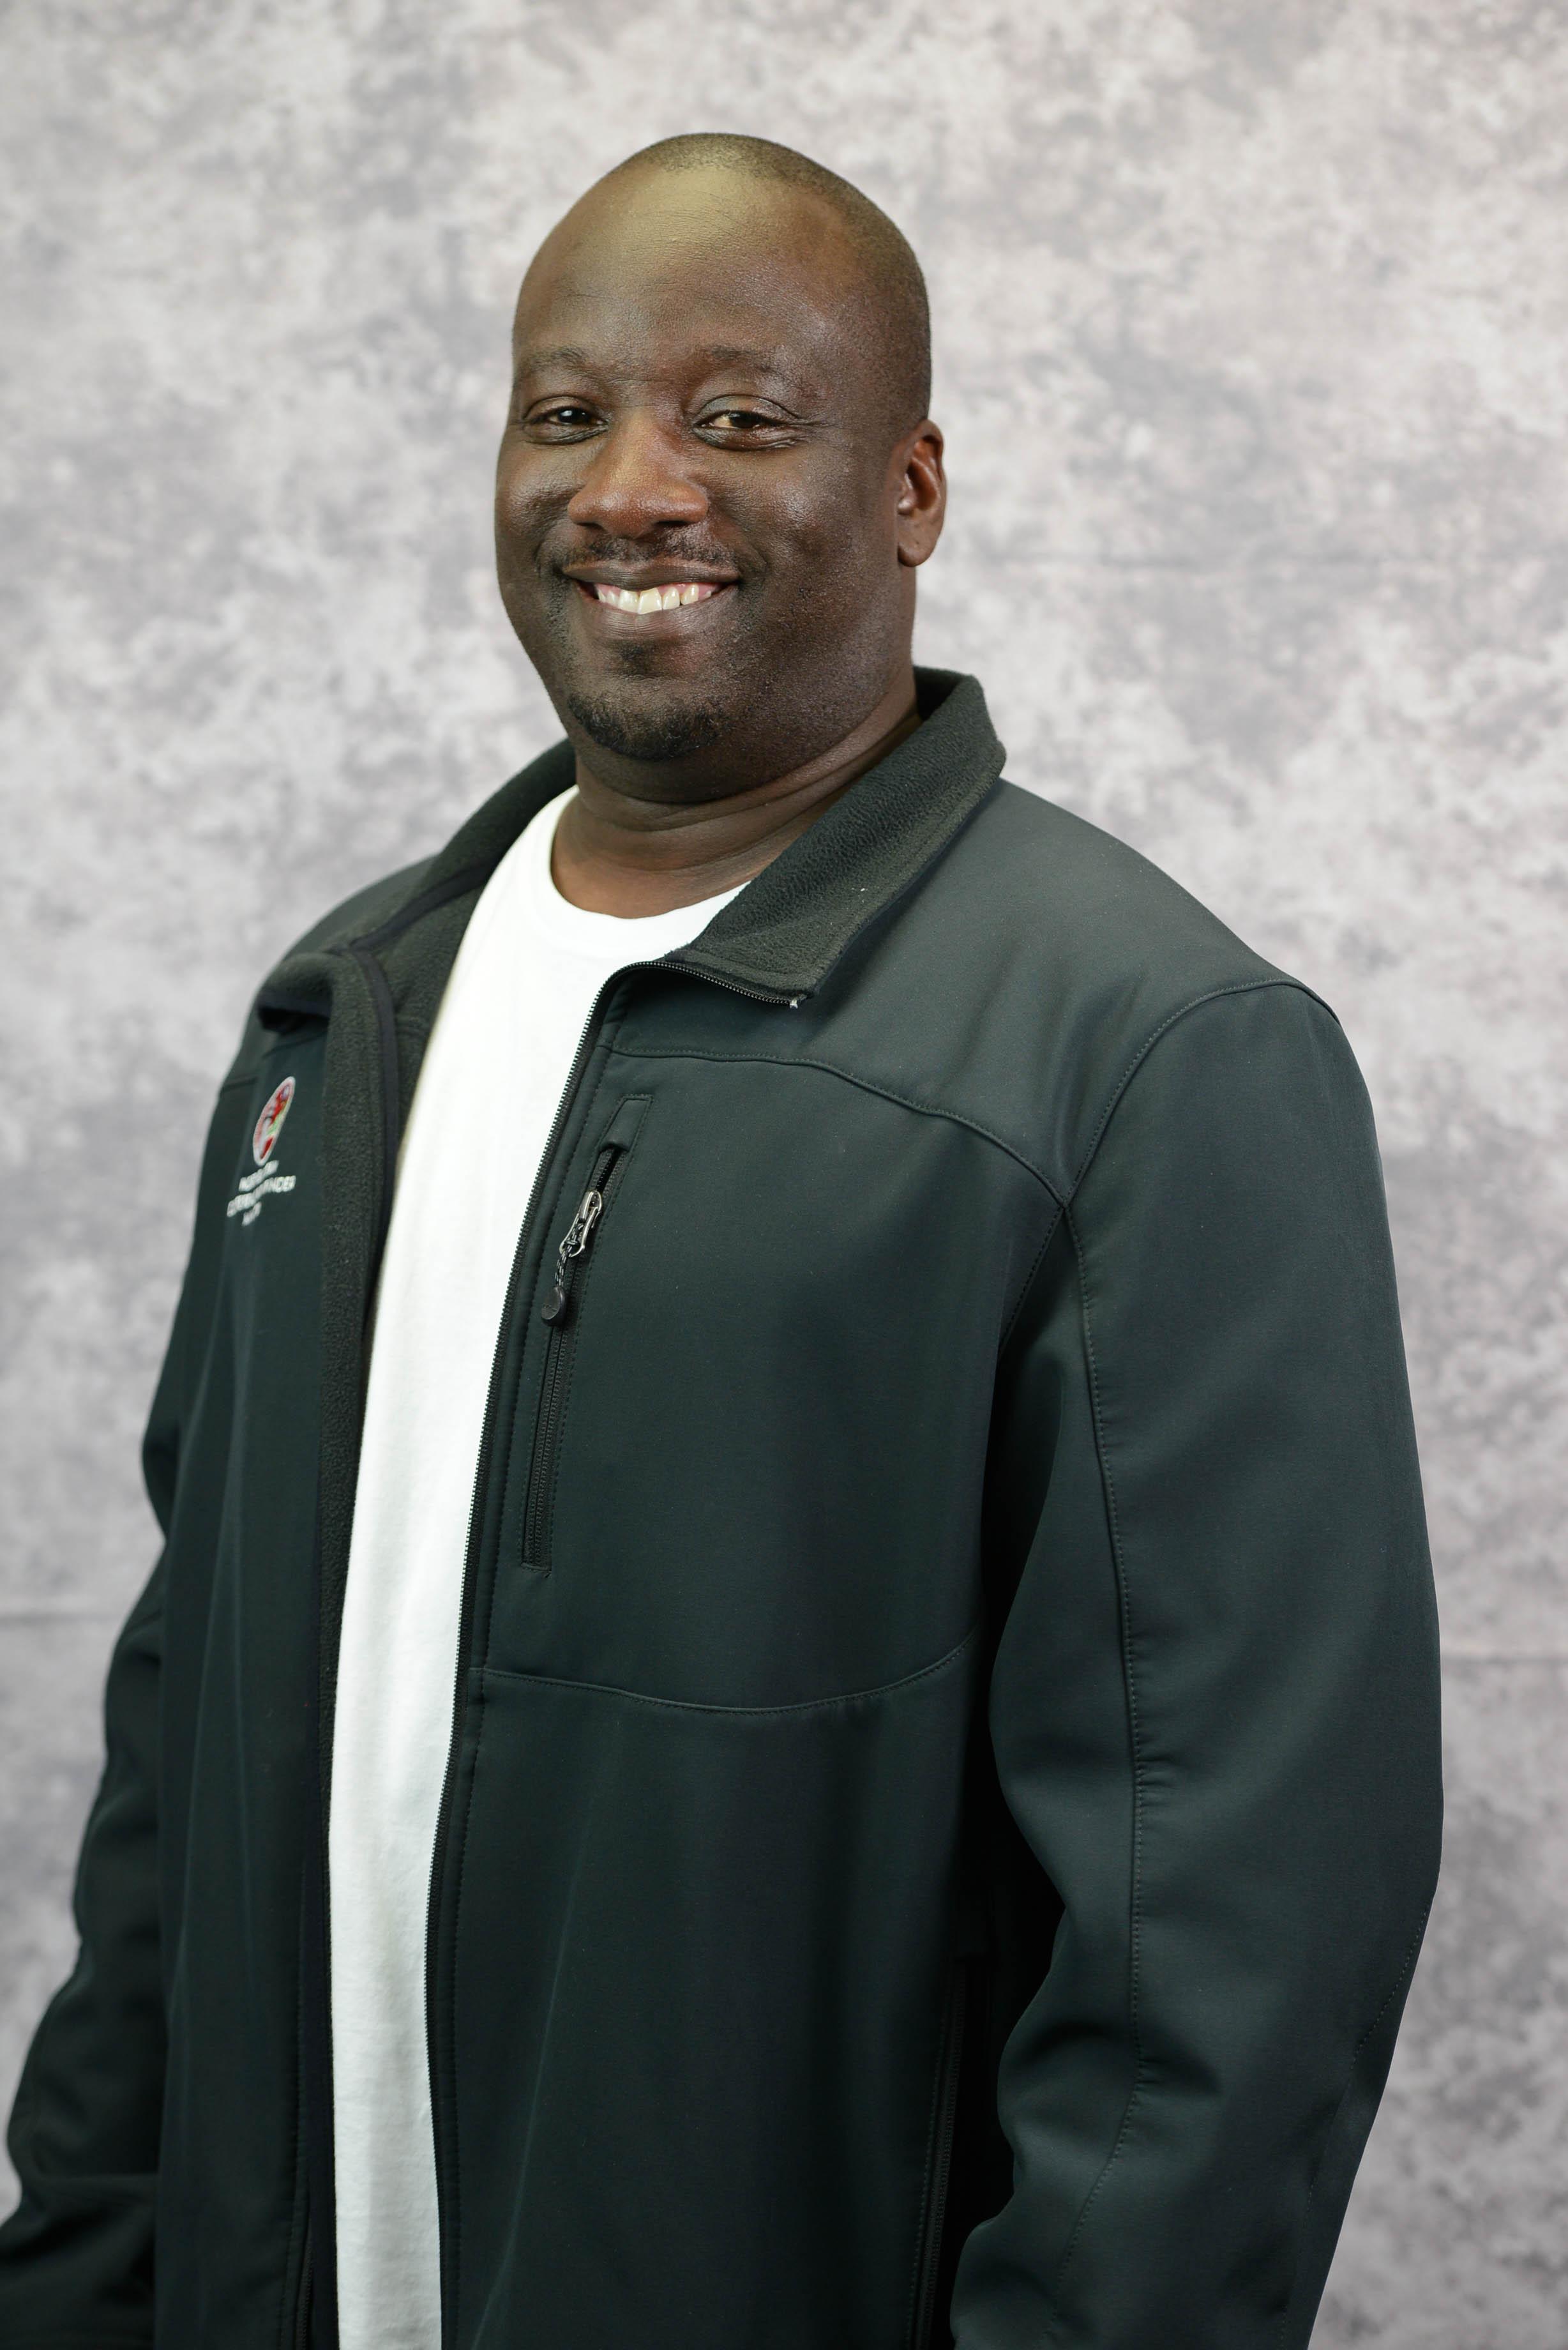 Michael Cuffie, Area Coordinator, Bx-Man.